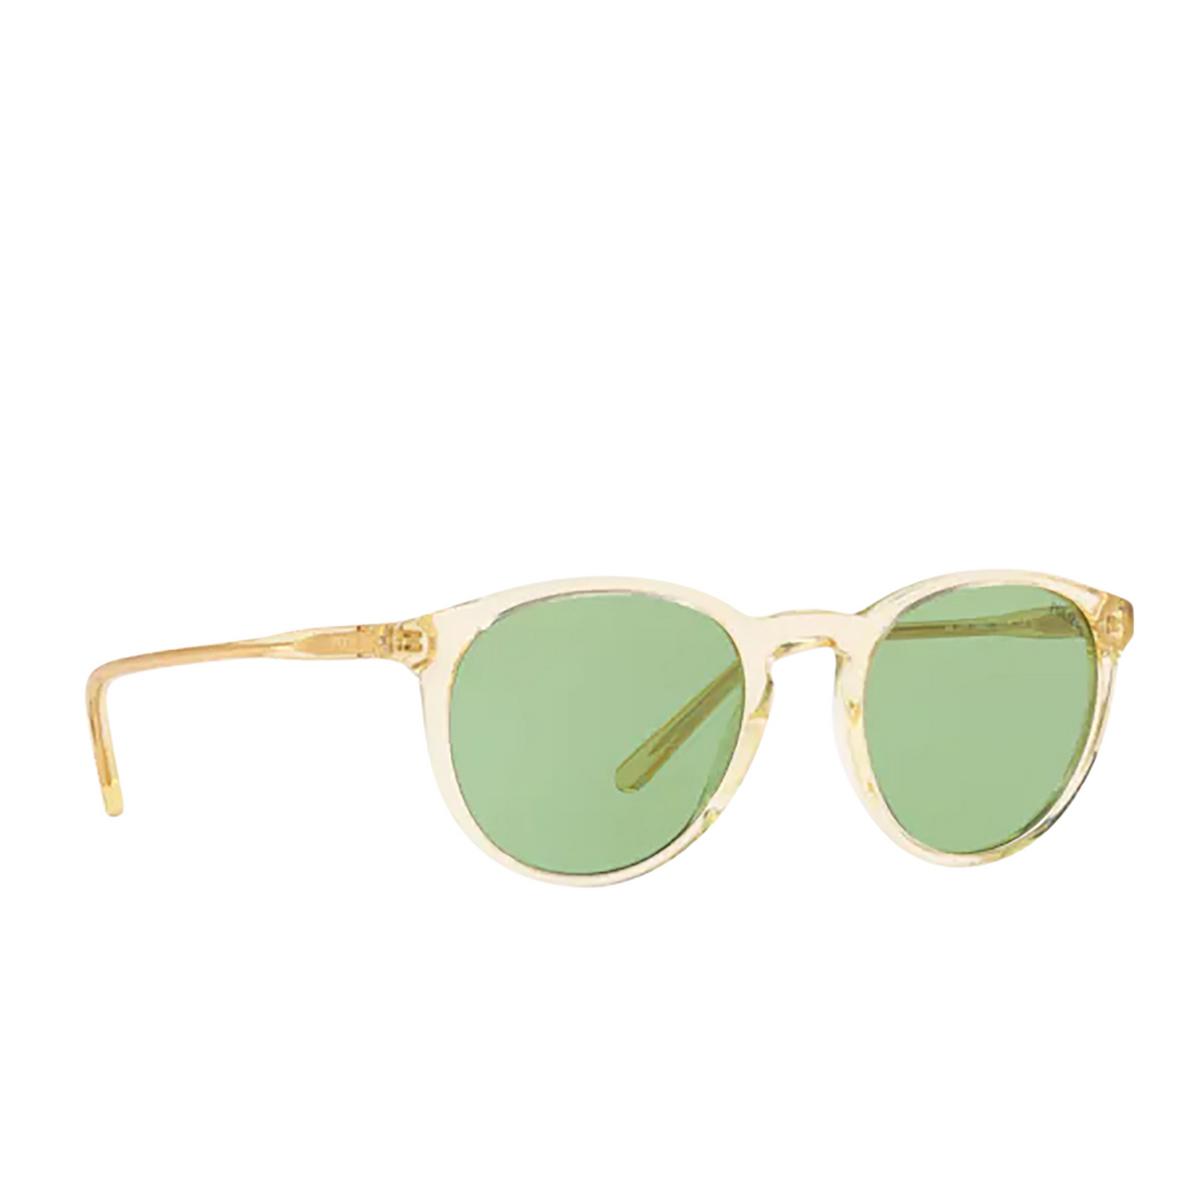 Polo Ralph Lauren® Round Sunglasses: PH4110 color Shiny Grey Pinot 5864/2.